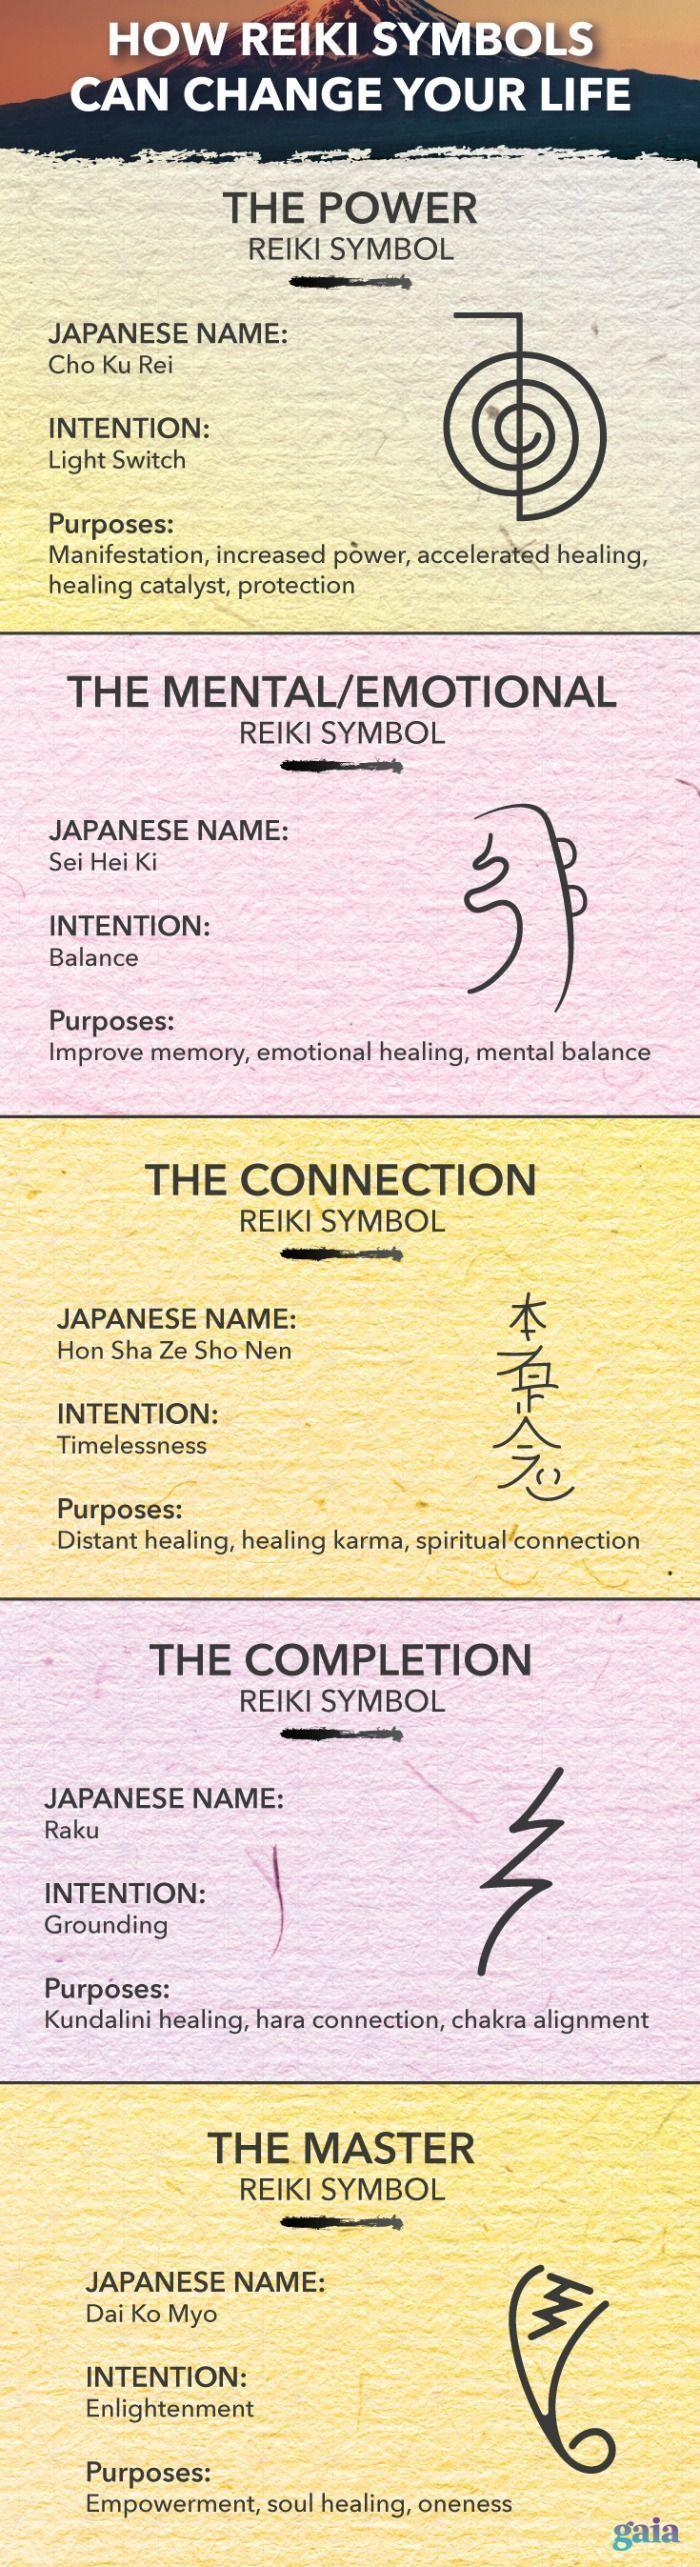 Benefits of reiki healing therapy reiki symbols symbols and chakras buycottarizona Images